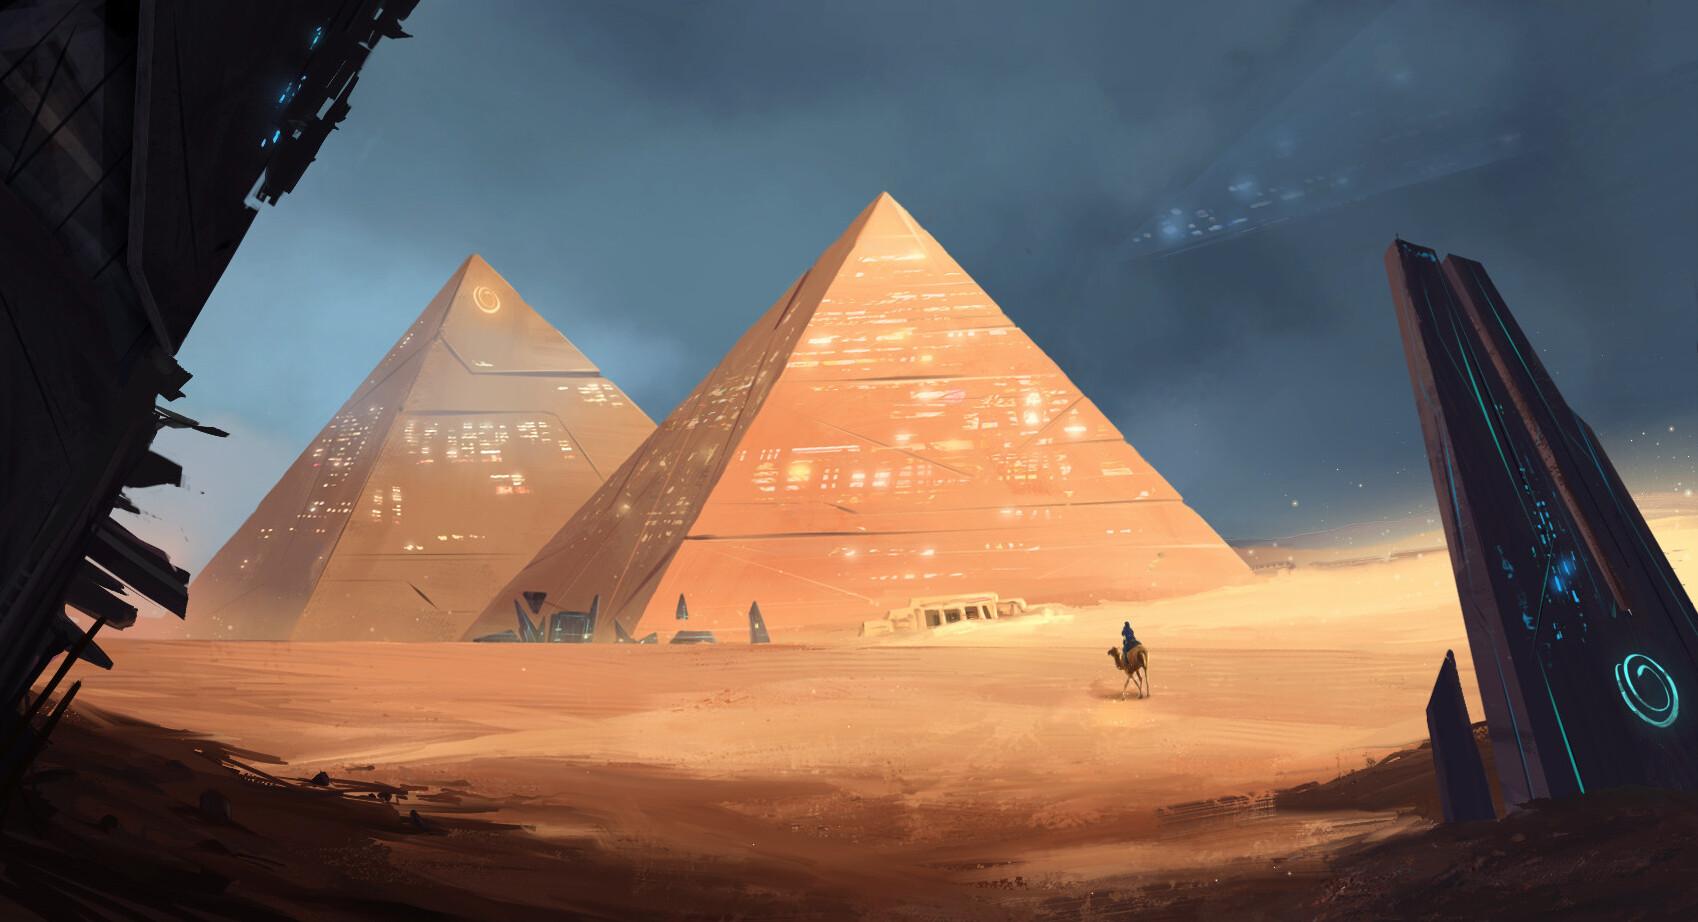 Mj venegas spadafora mj venegas spadafora pyramids13